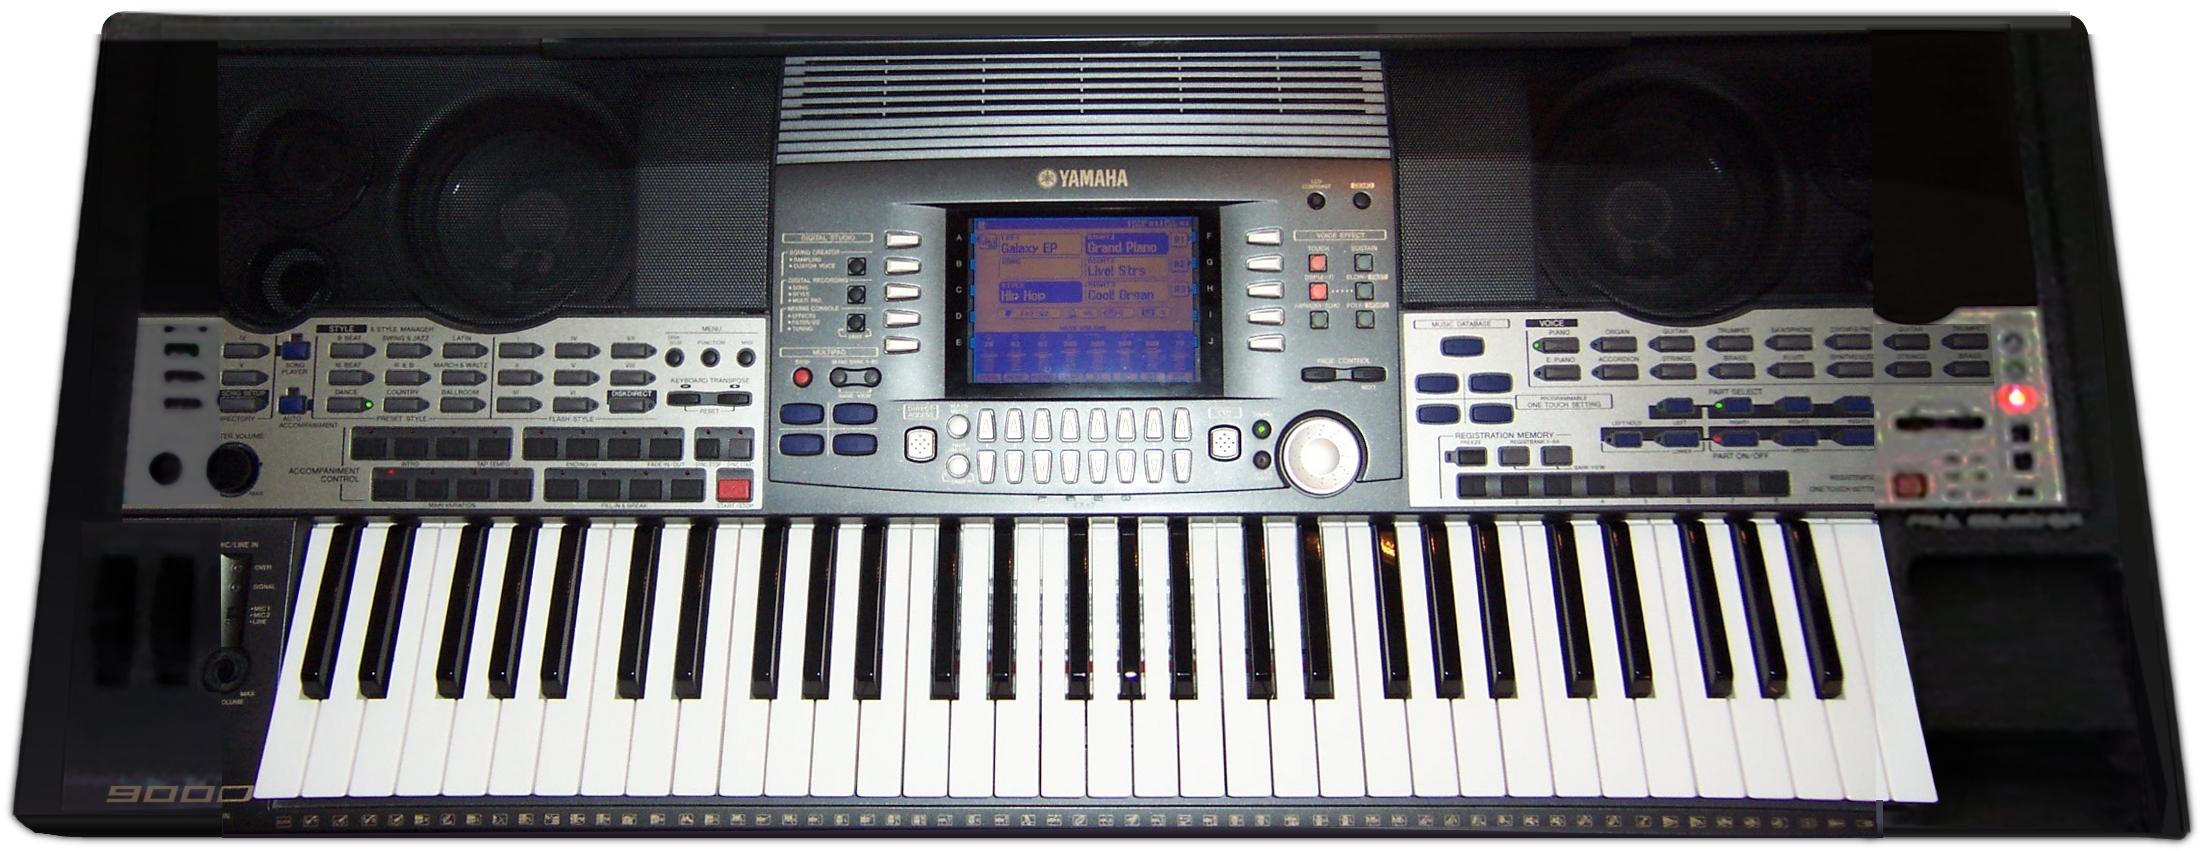 Yamaha Keyboard History